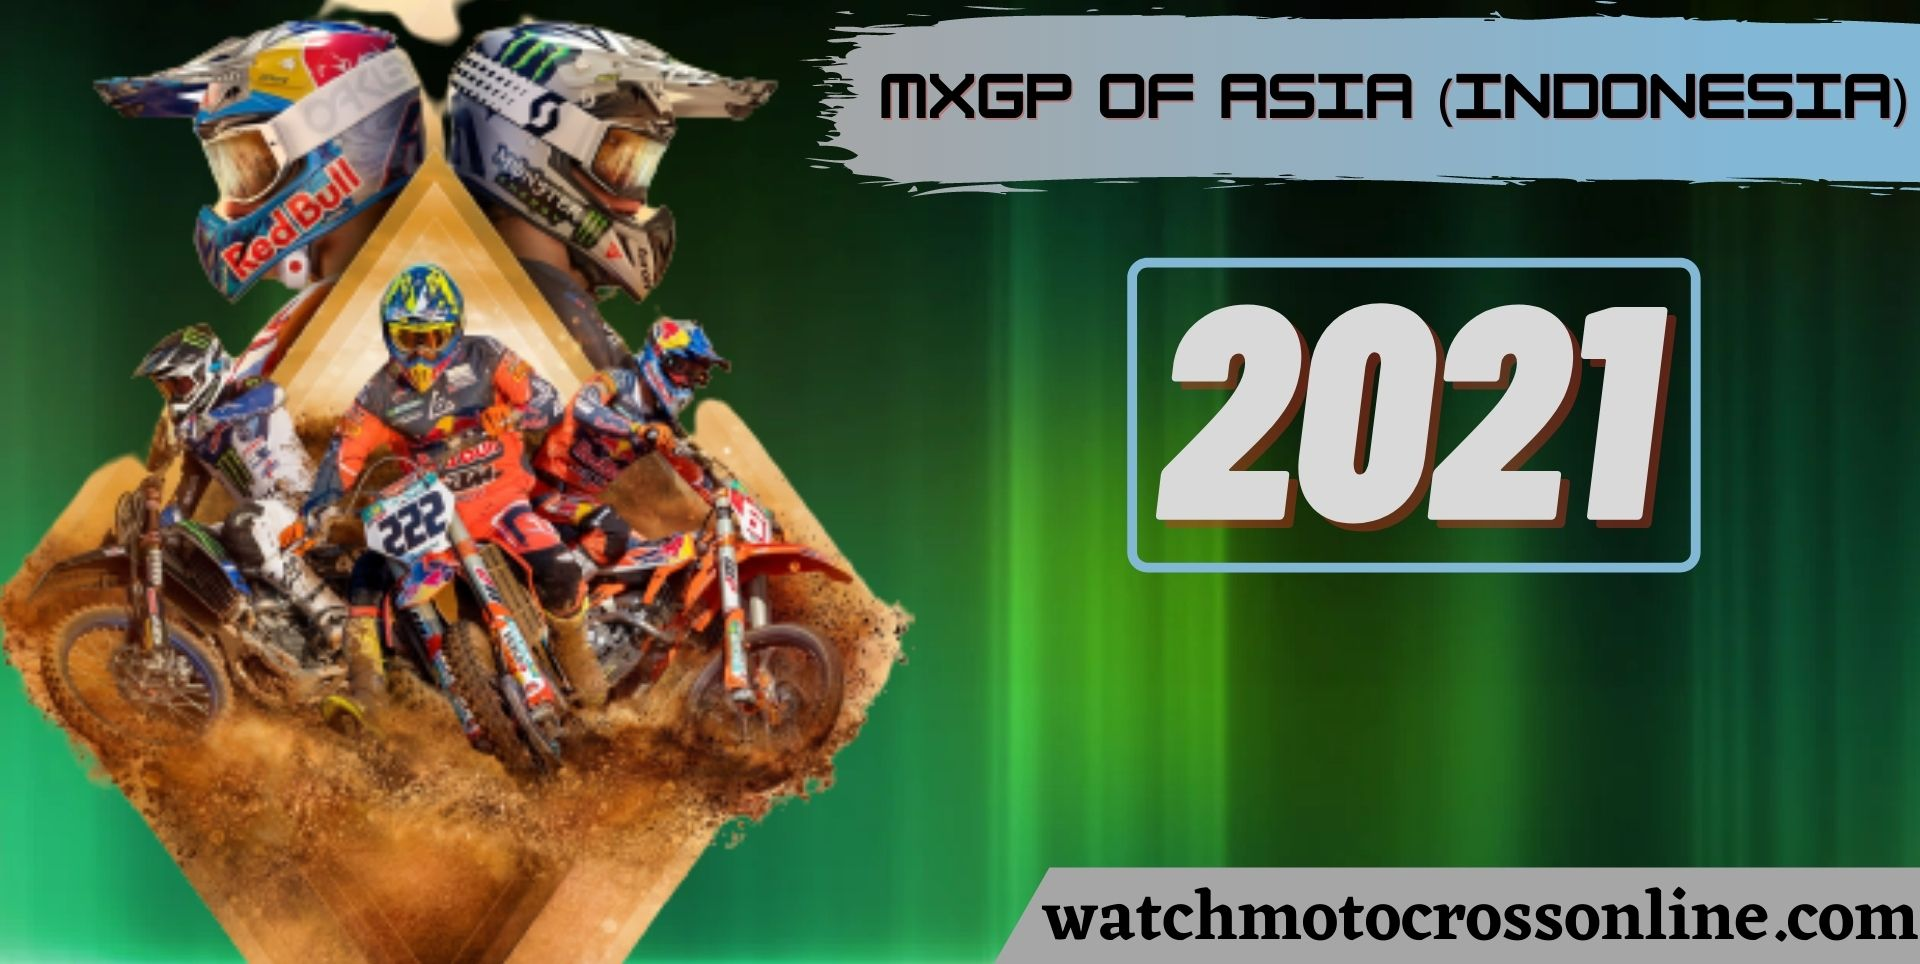 MXGP Of ASIA (INDONESIA) Live Stream 2021